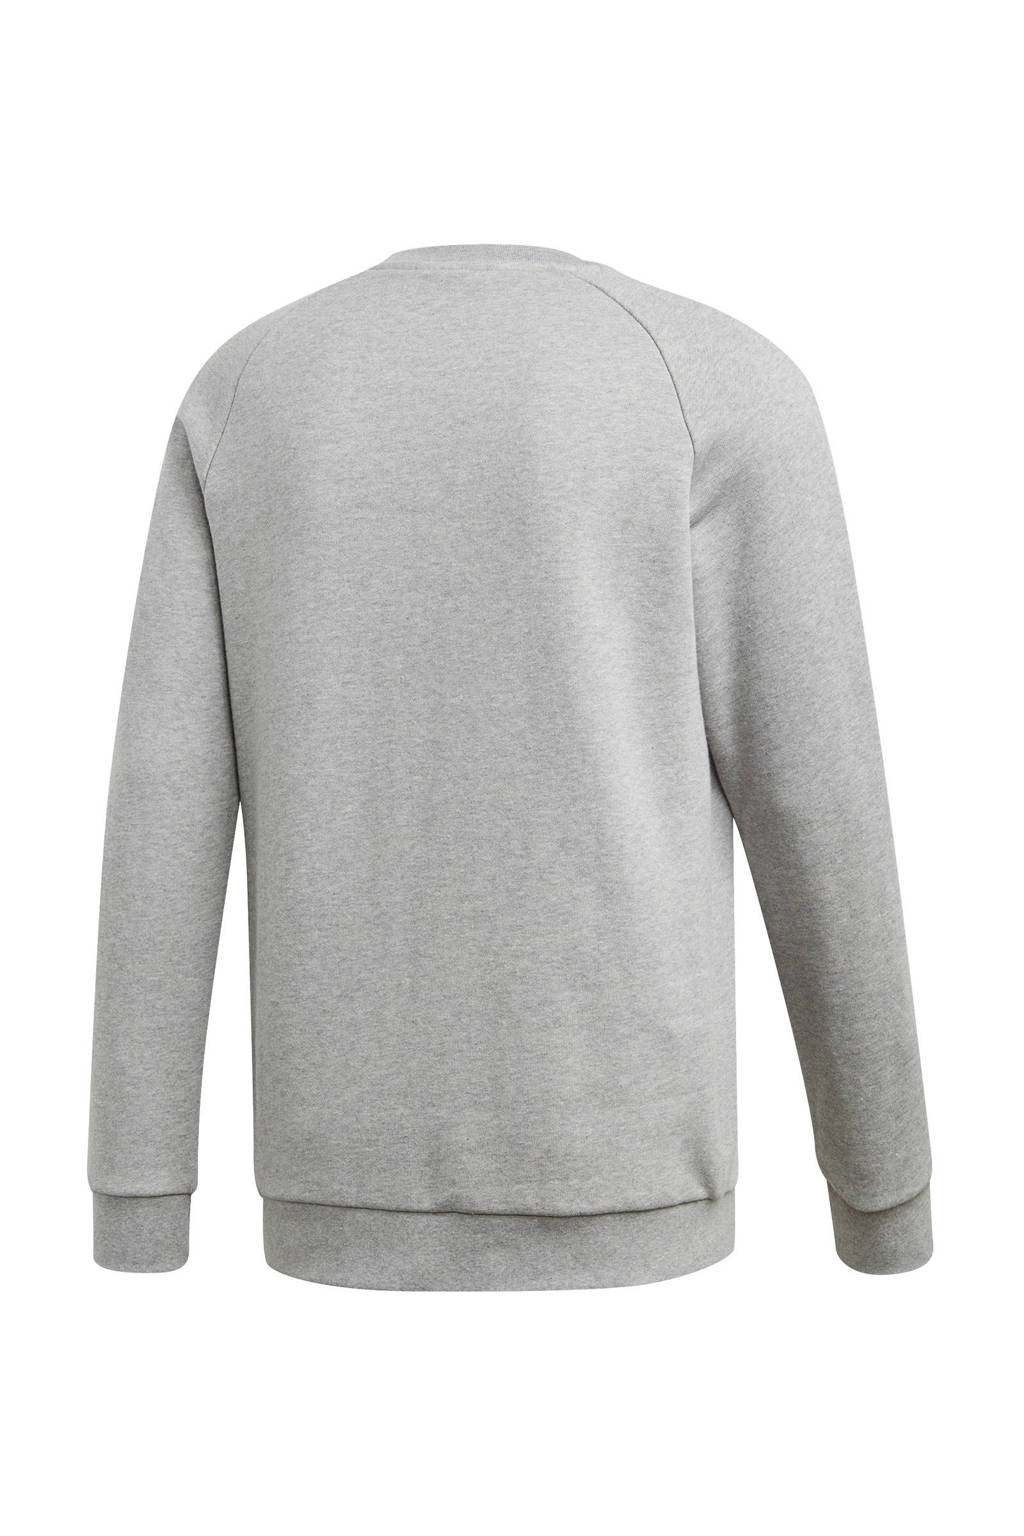 adidas originals   sweater, Grijs melange